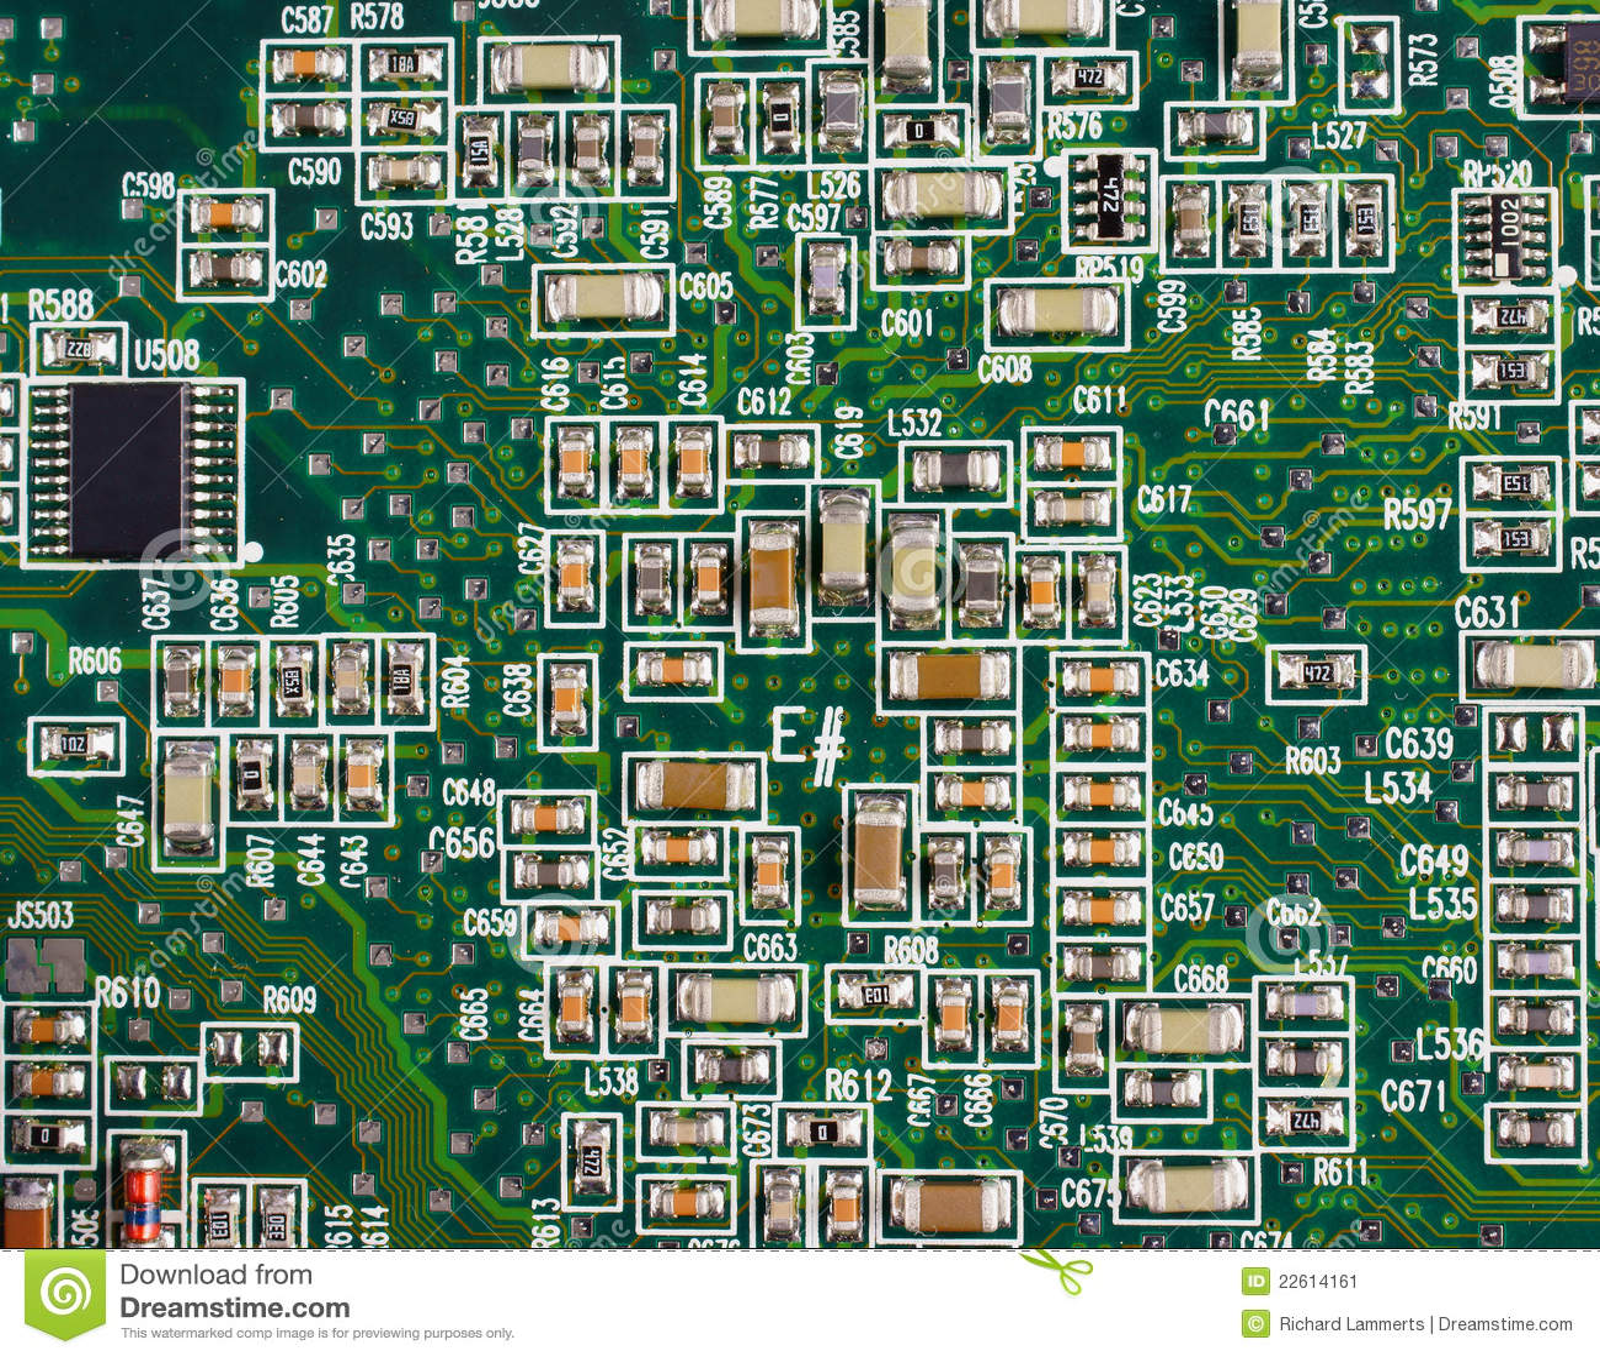 Computer Circuit Board Parts